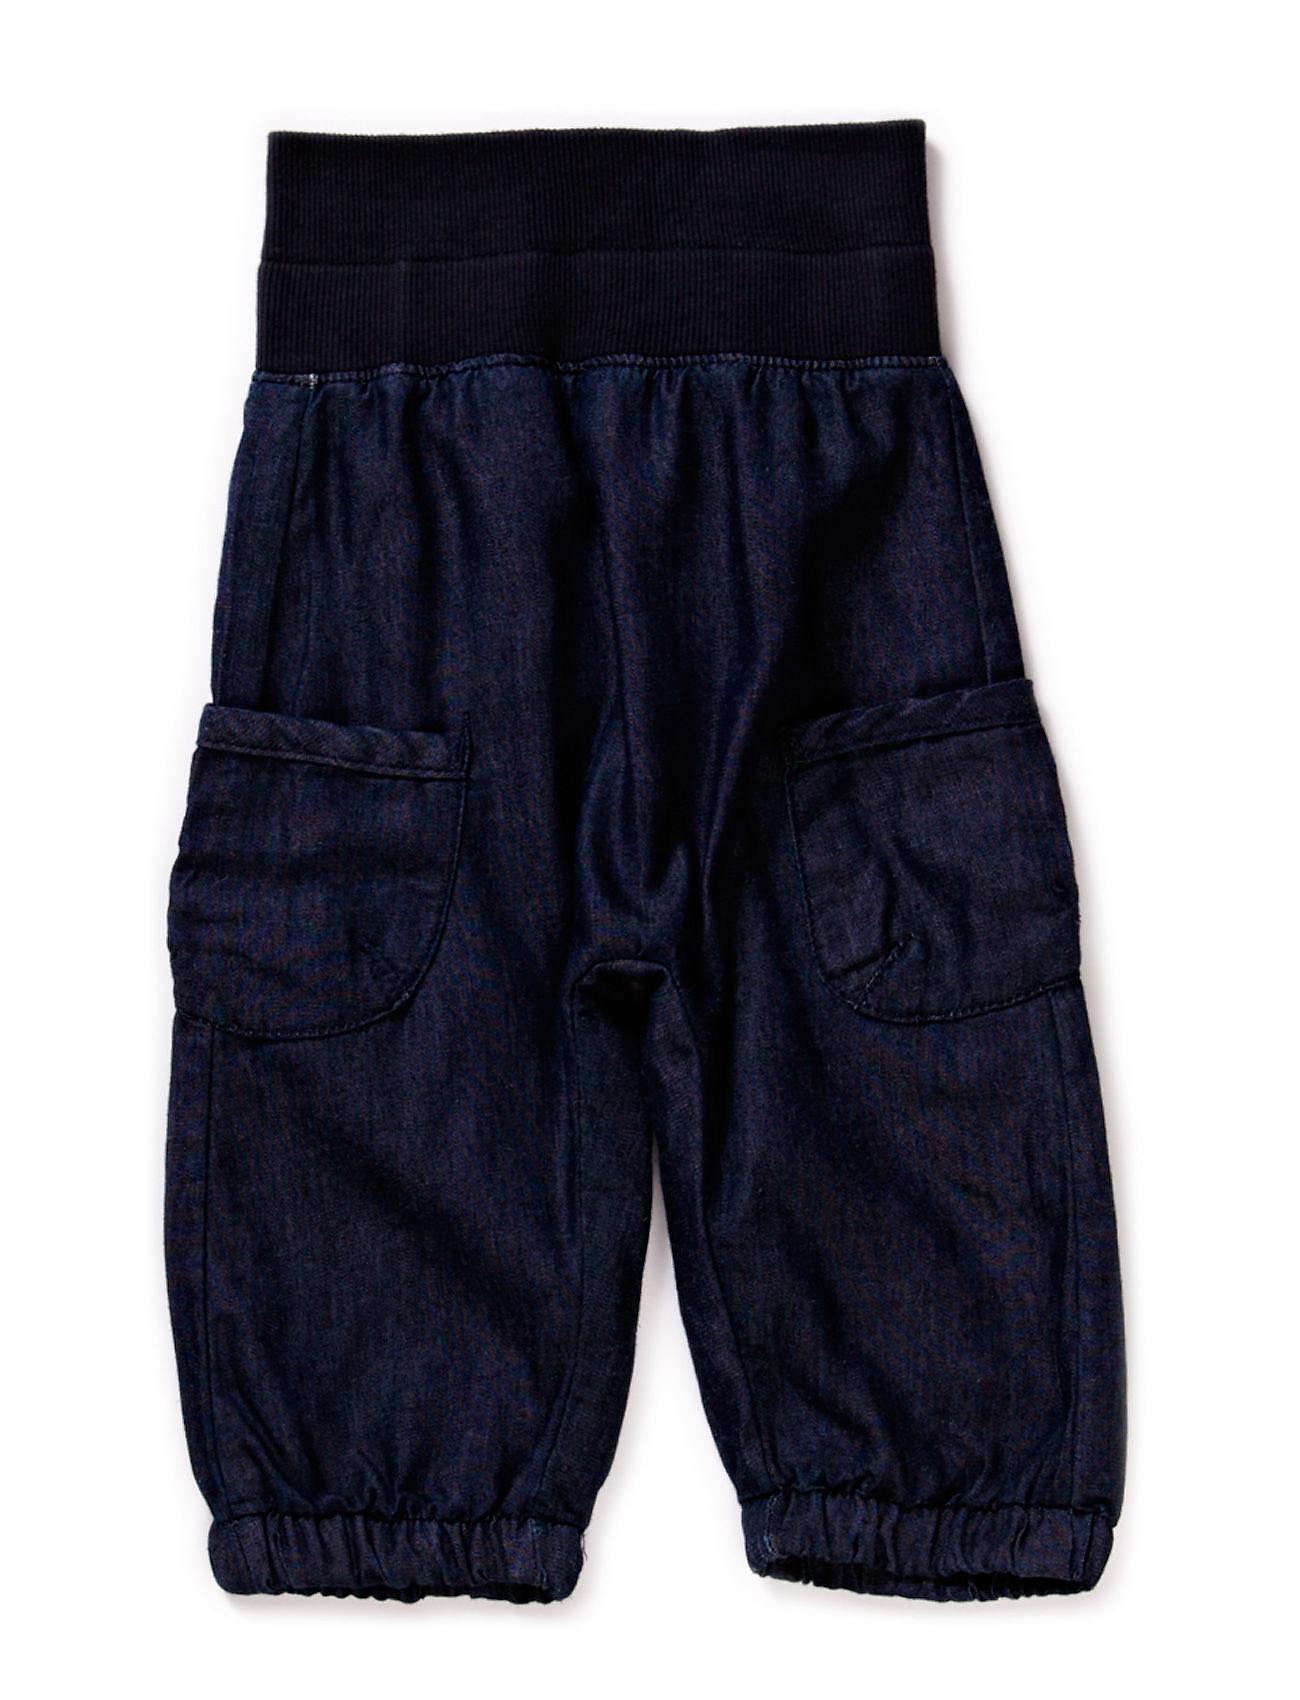 Minymo Baggy pants -UNISEX - DARK BLUE